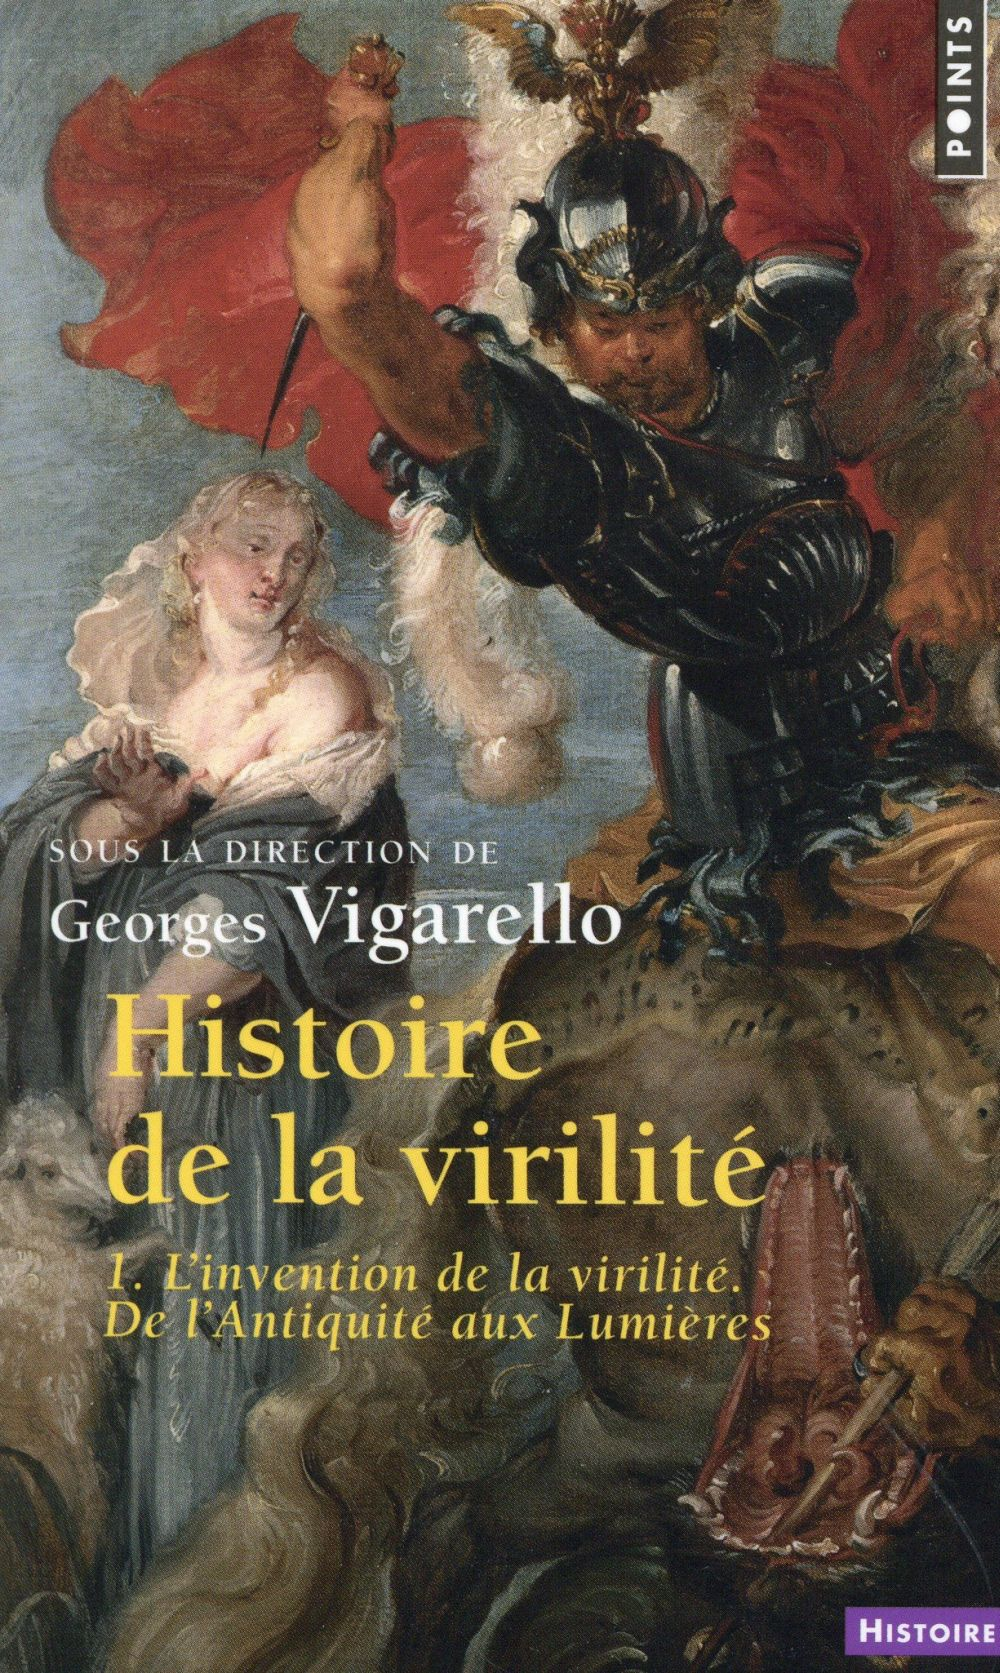 HISTOIRE DE LA VIRILITE, T. 1. L-INVENTION DE LA V